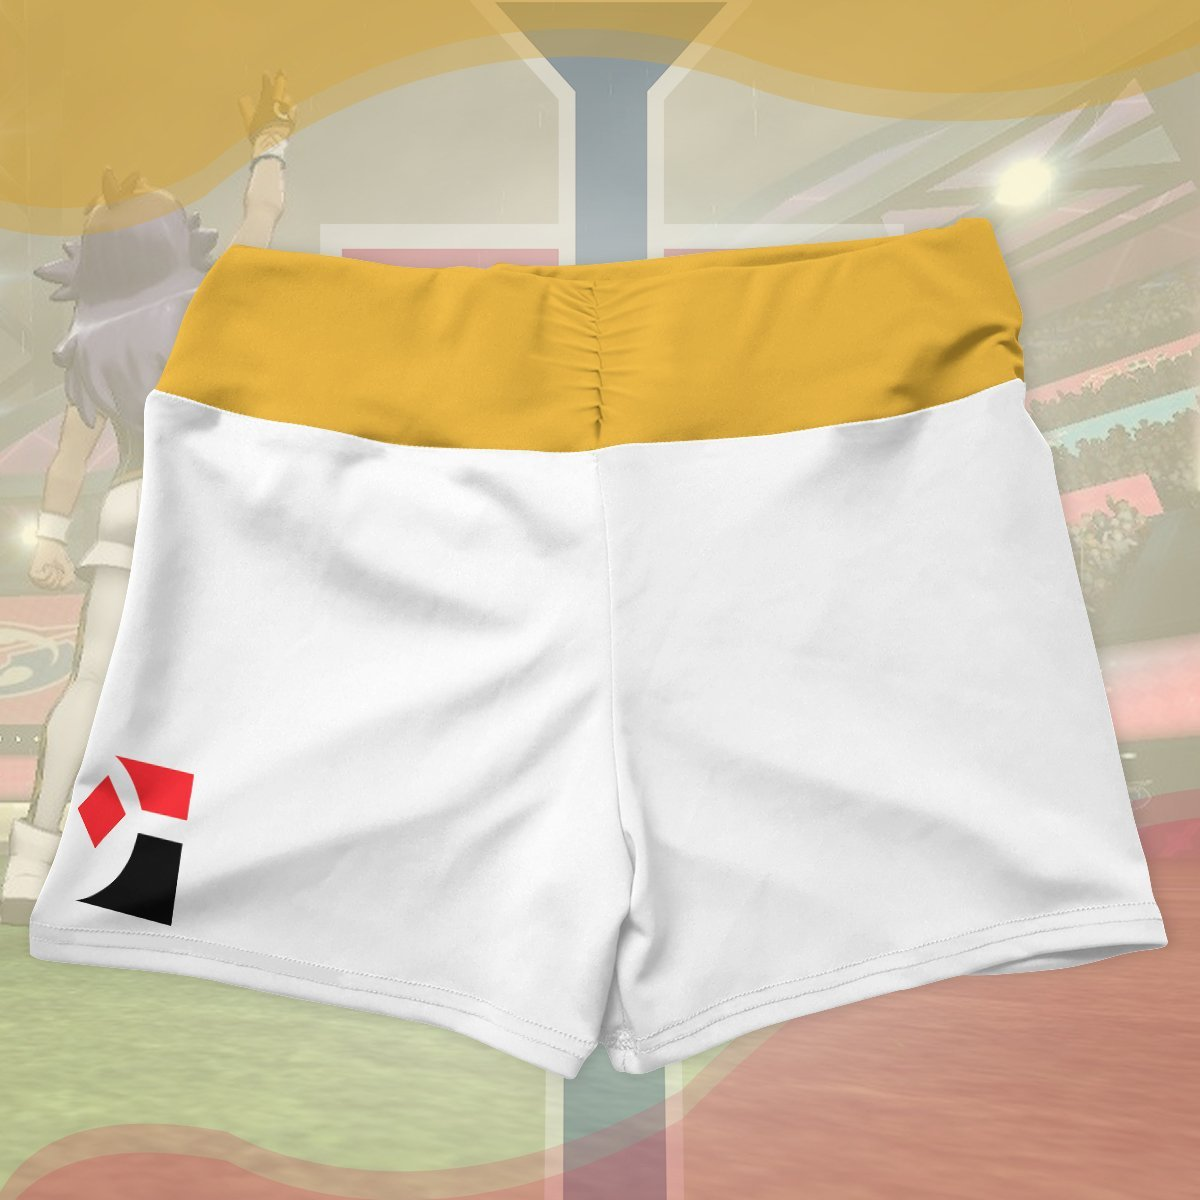 pokemon champion uniform active wear set 858757 - Anime Swimsuits